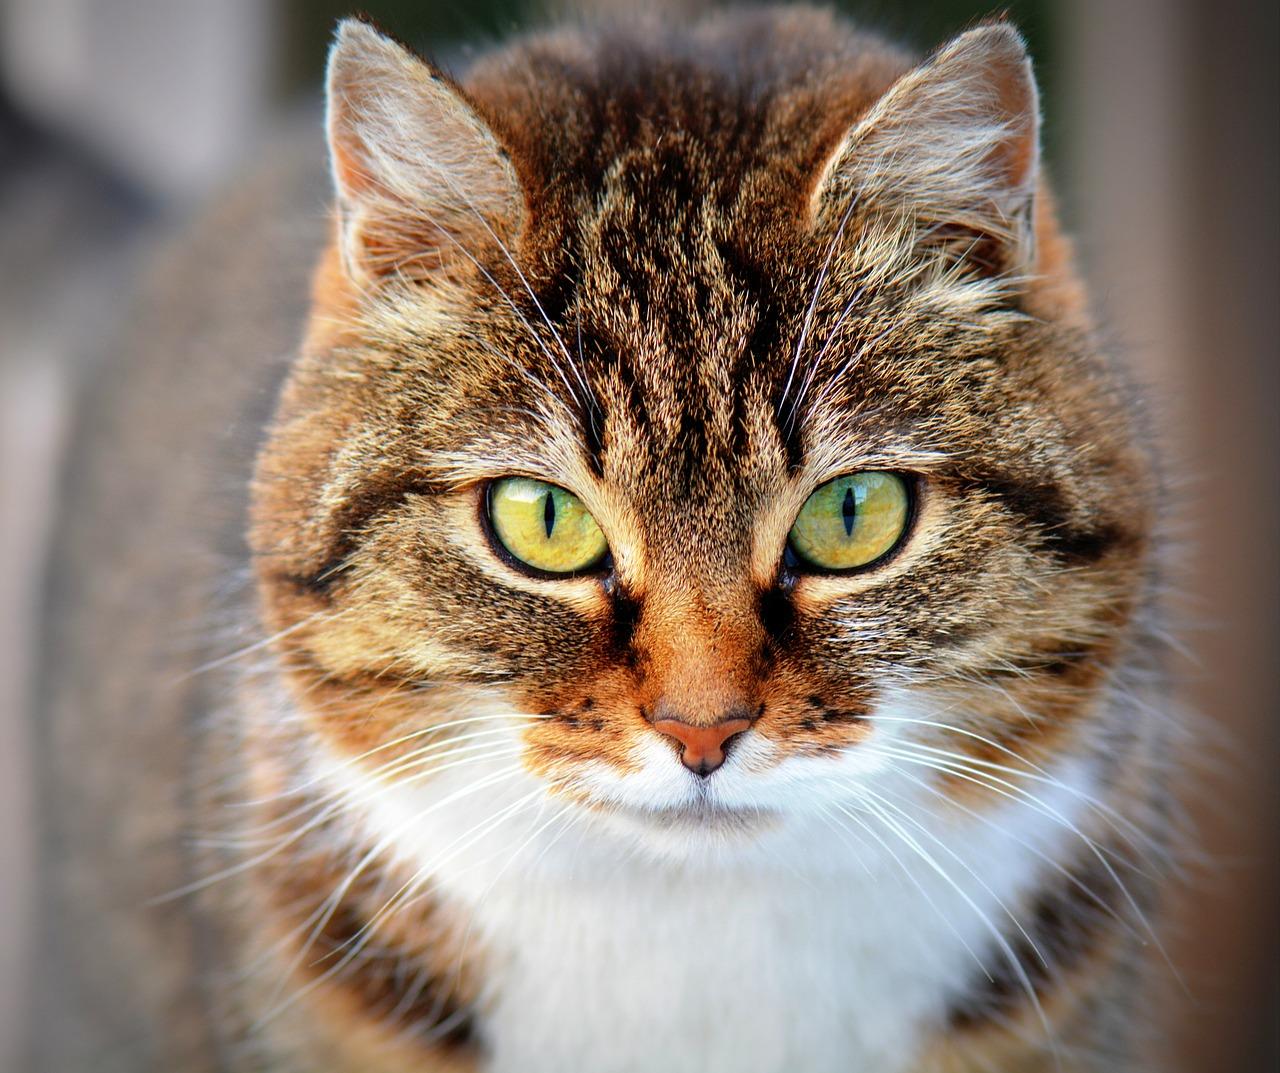 chat-photographier-un-animal